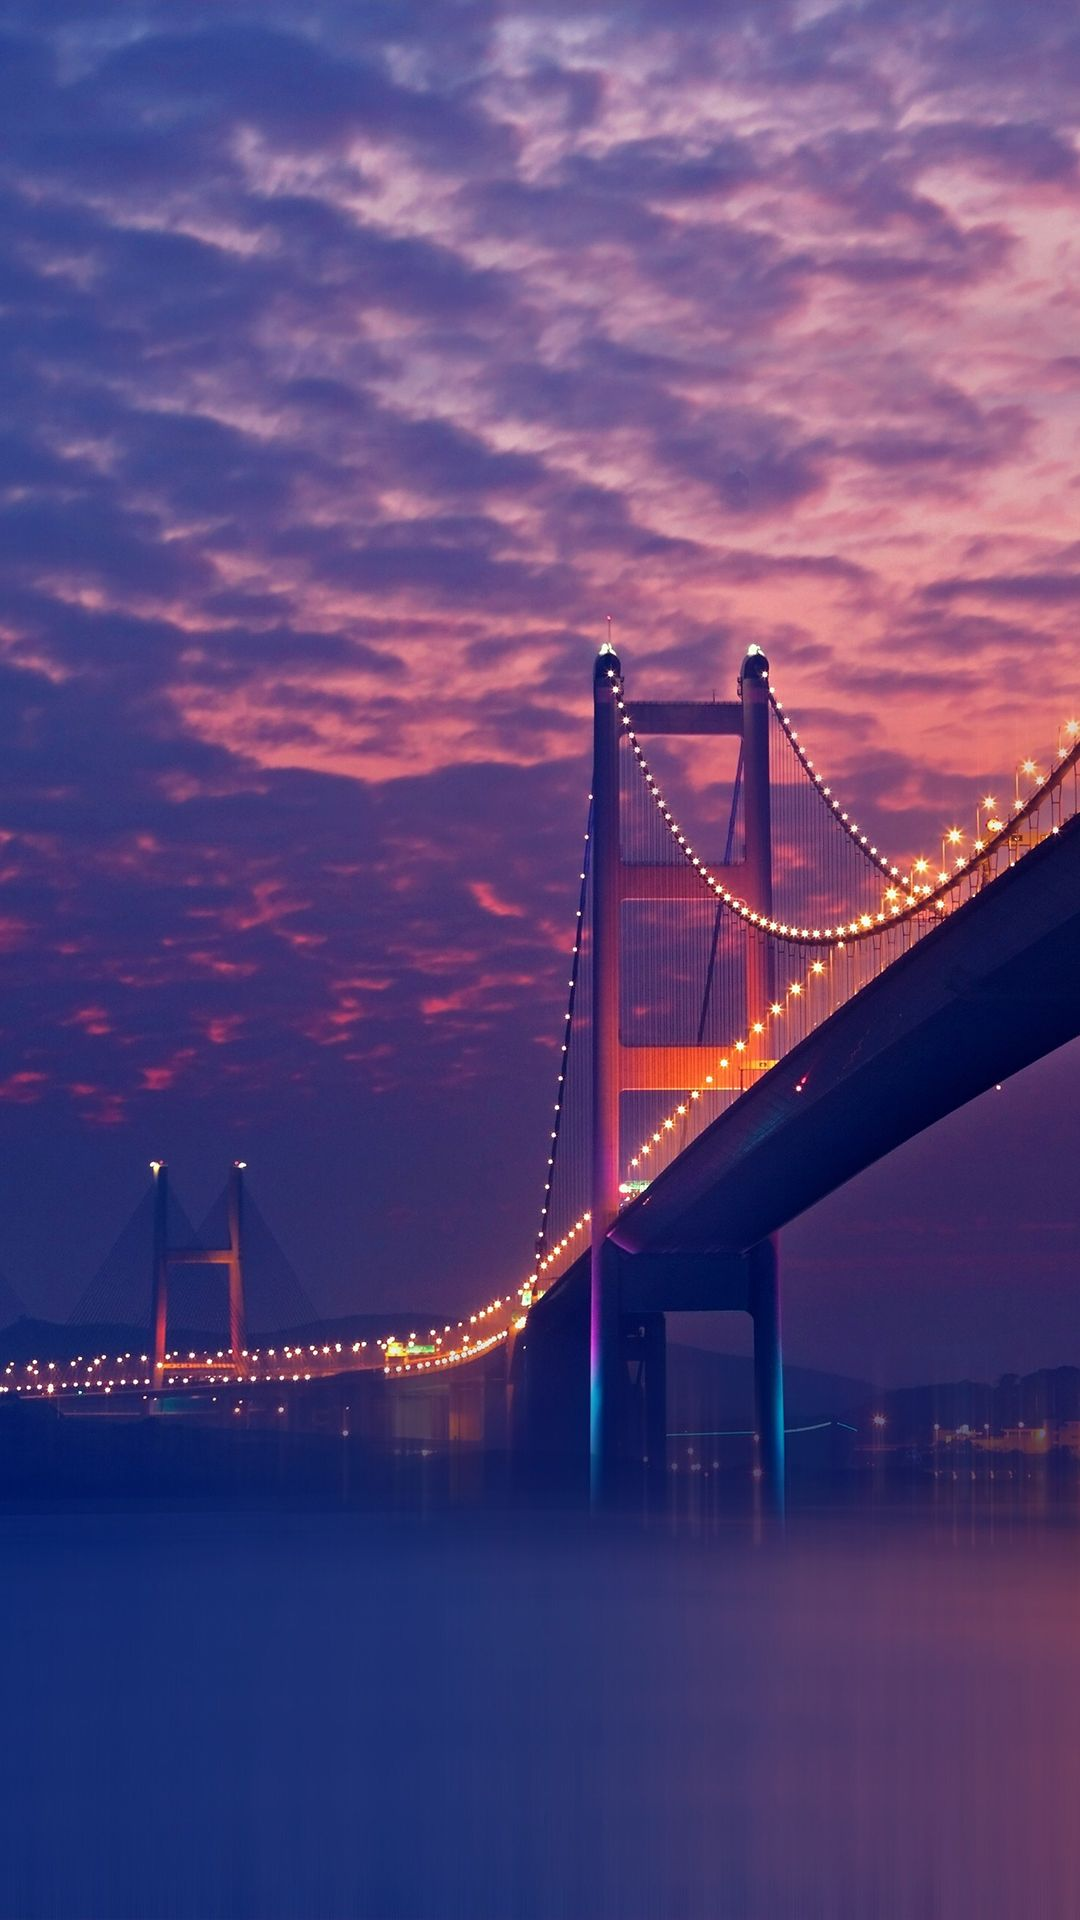 purple night bridge lights iphone 6+ hd wallpaper | iphone